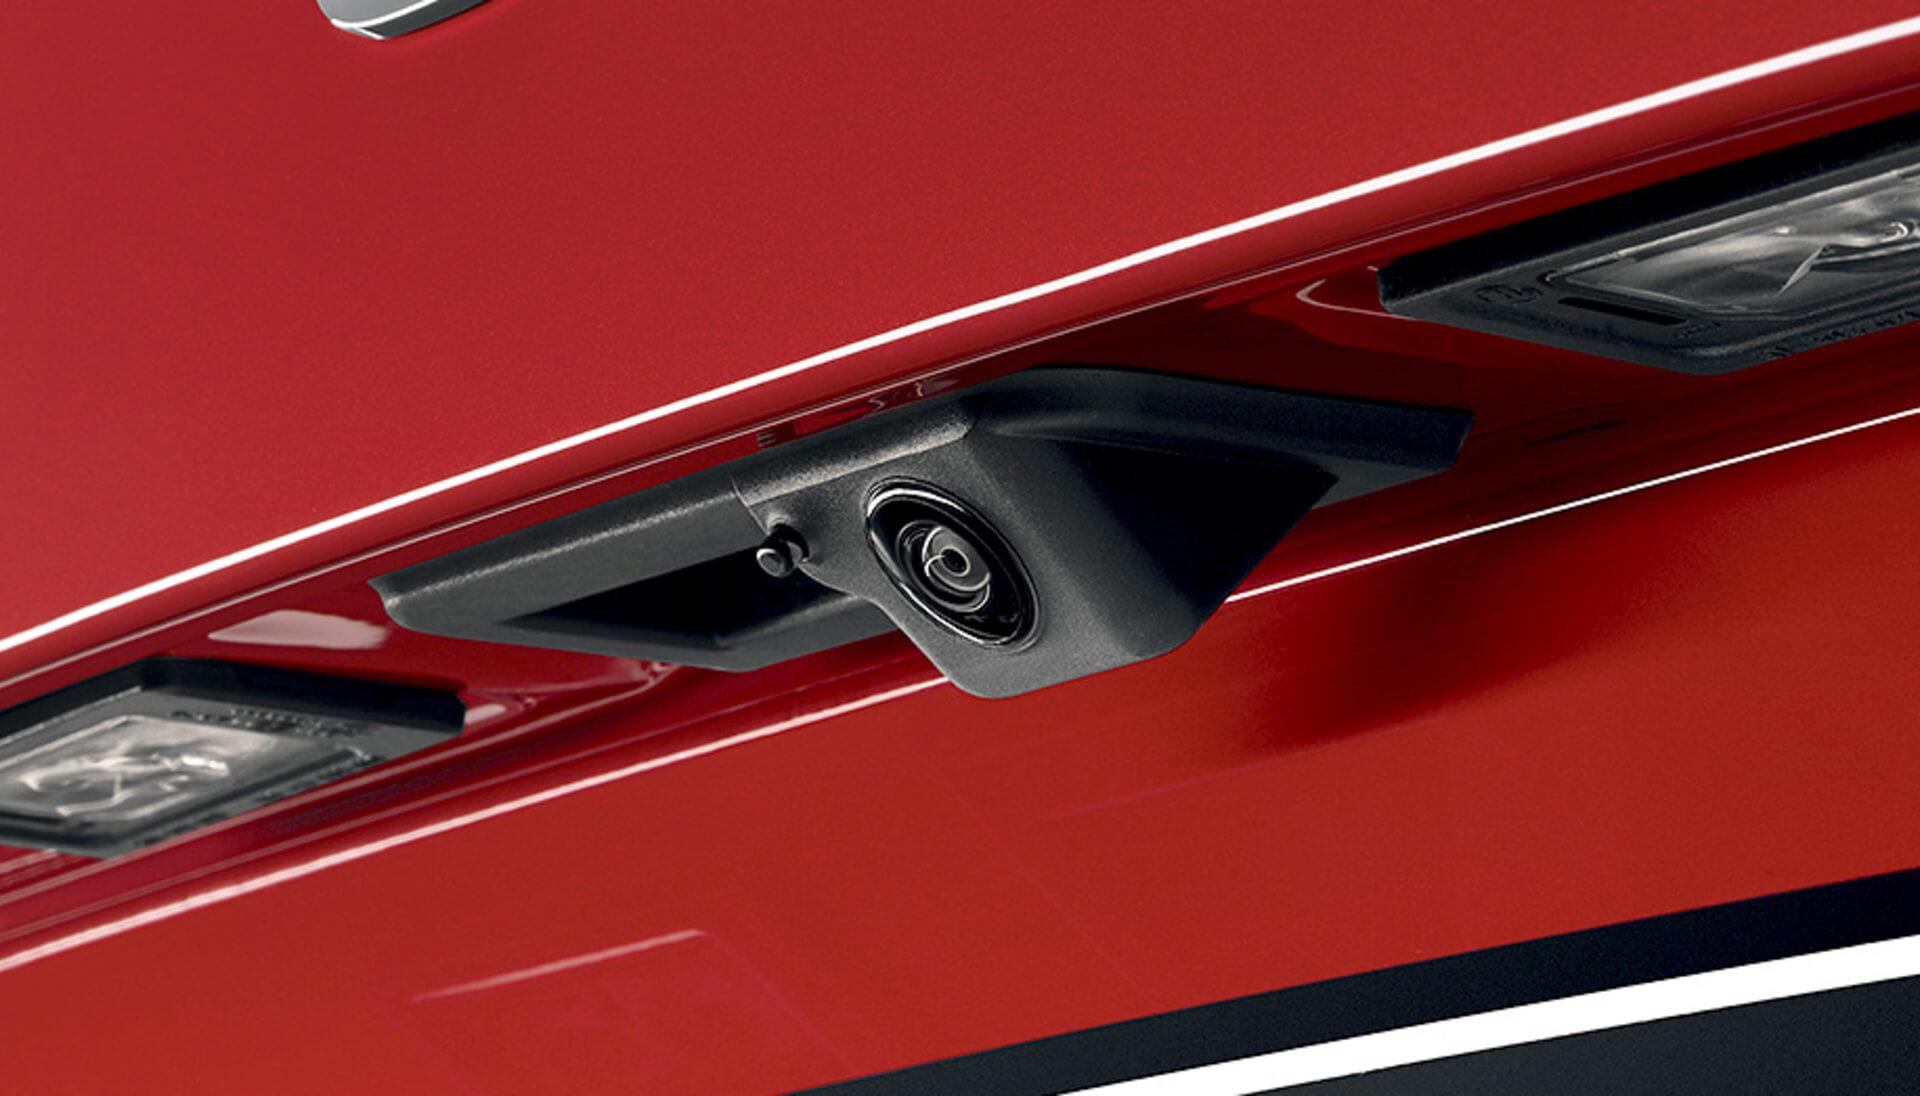 Kamiq Rear Parking Camera and Sensors